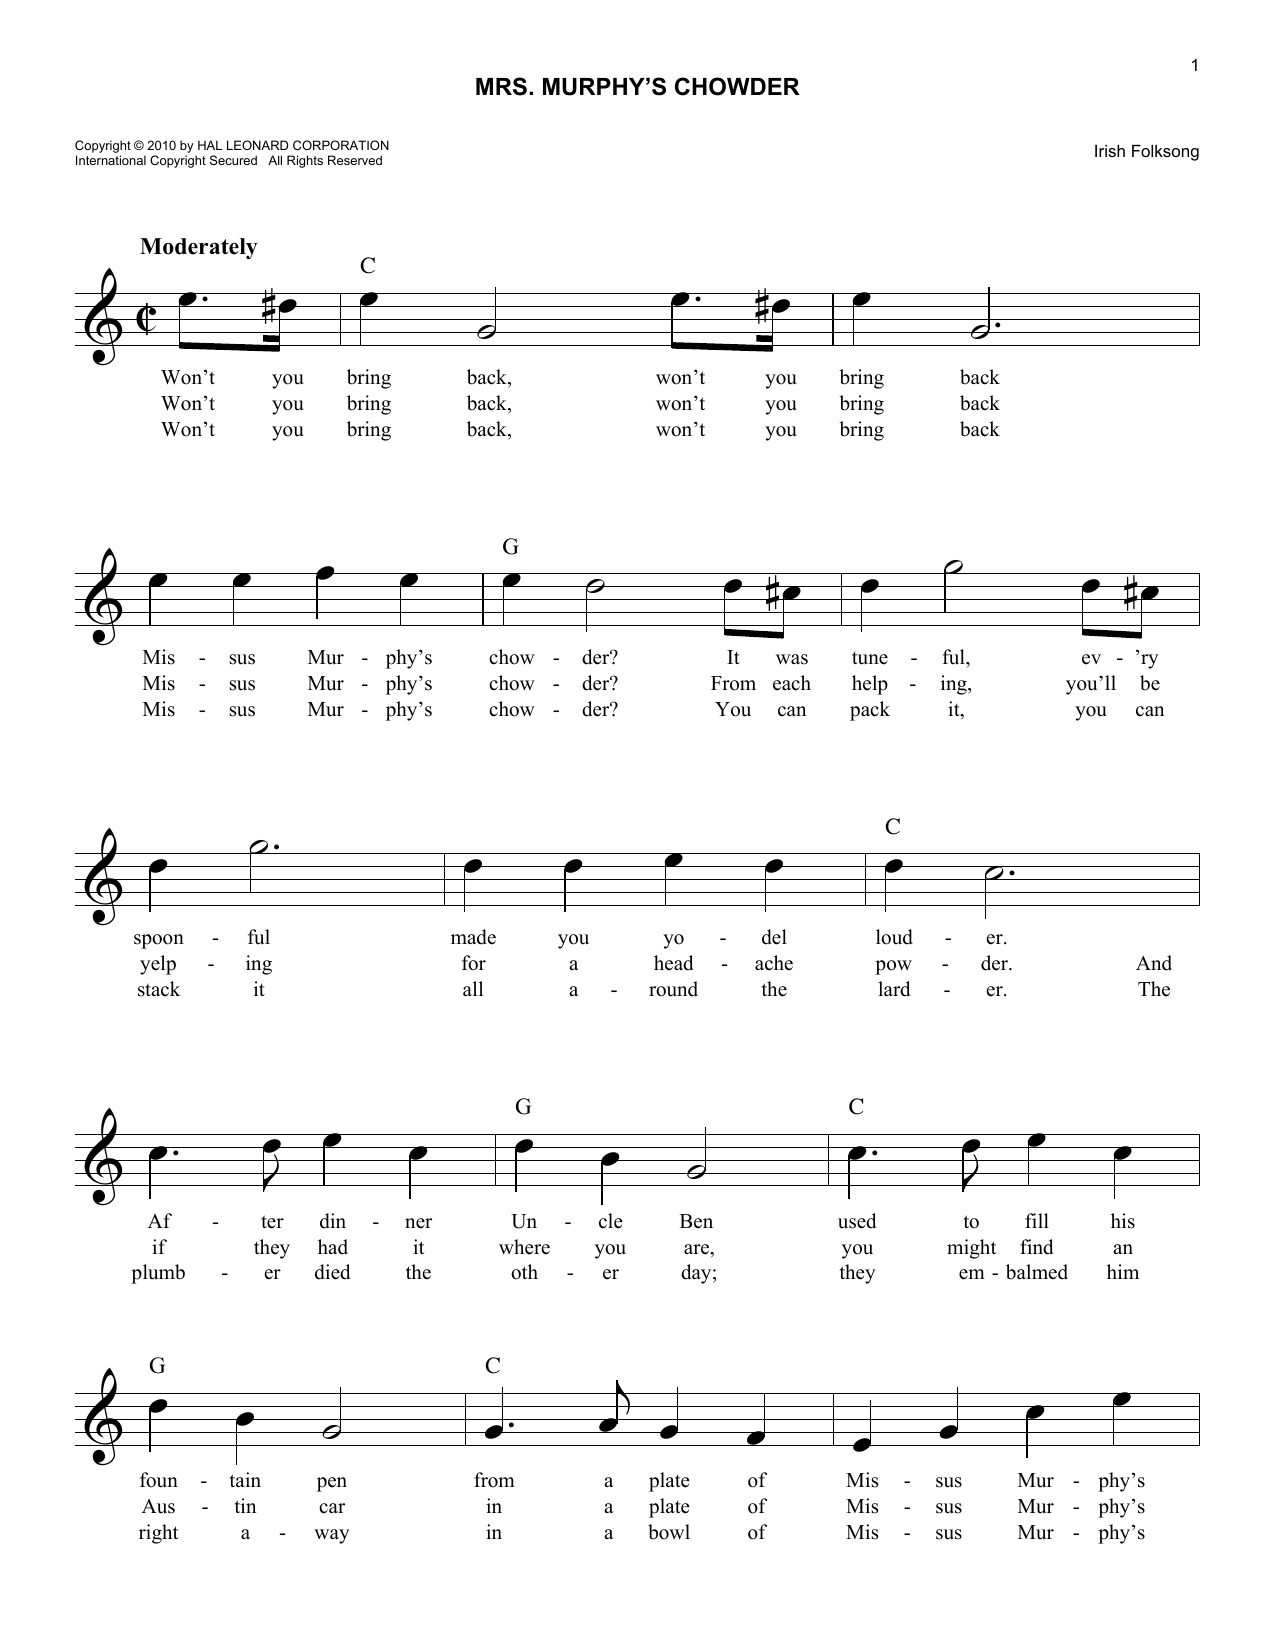 Mrs. Murphy's Chowder Sheet Music